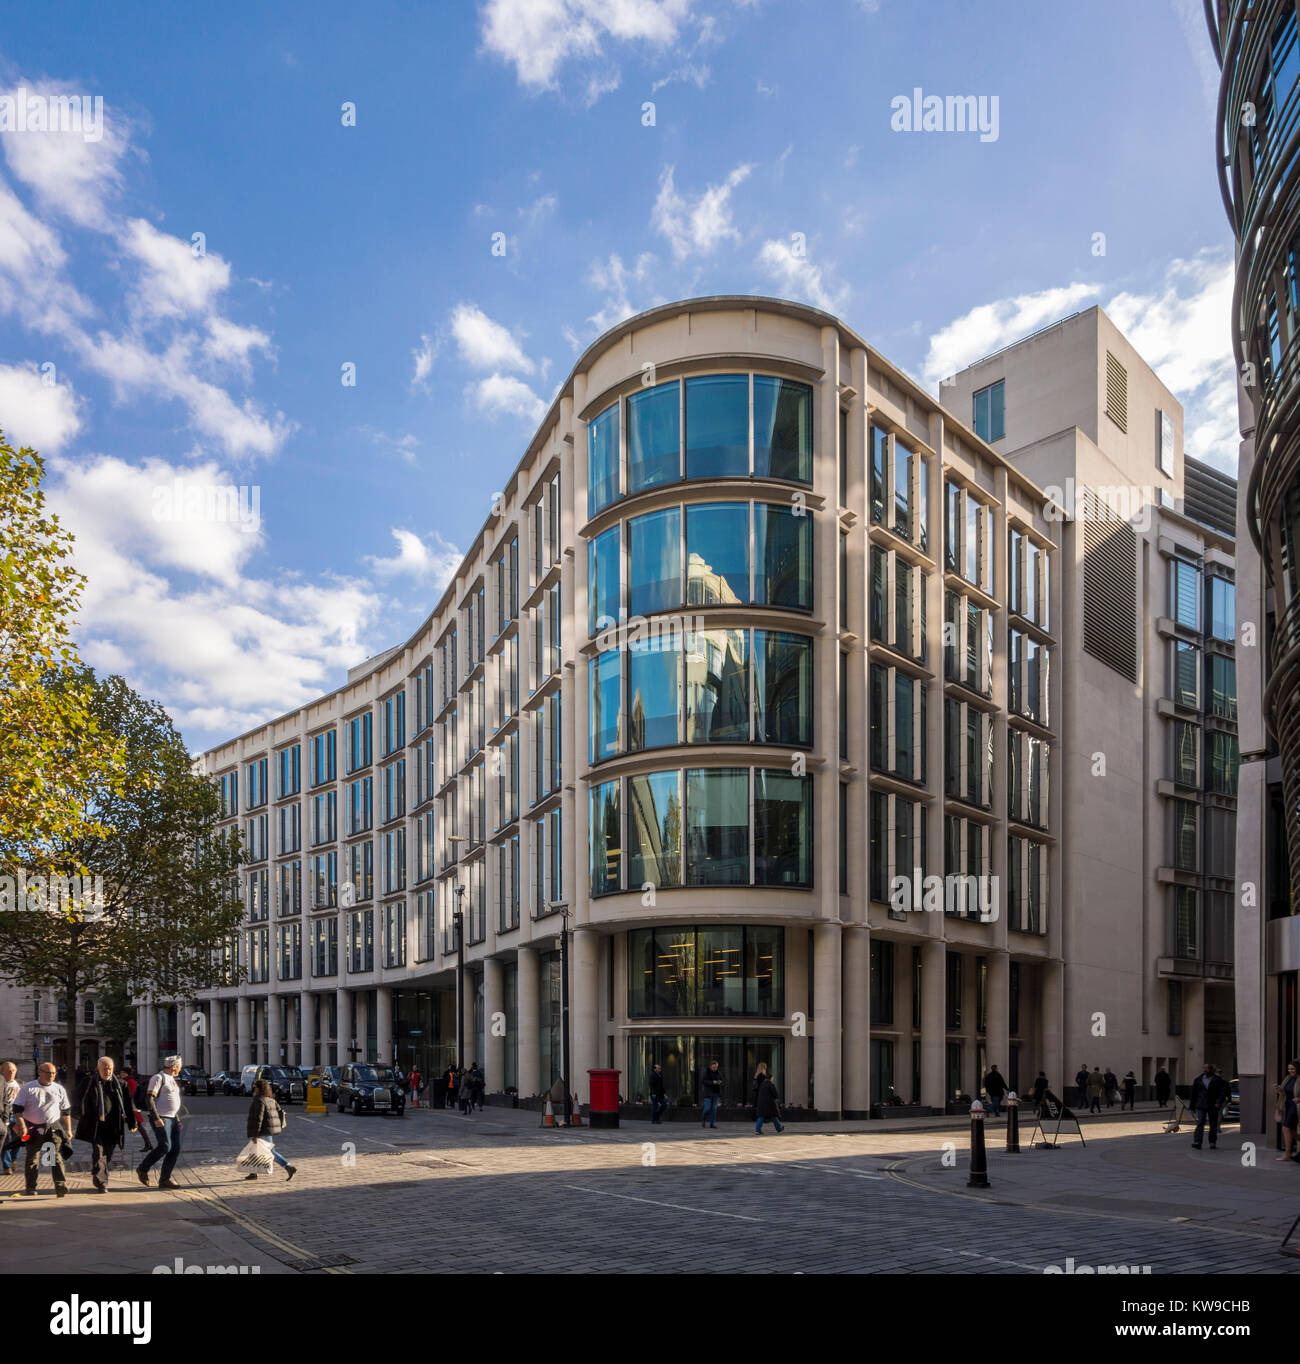 30 Gresham Street, by architects Sidell Gibson Partnership, City of London, UK - Stock Image